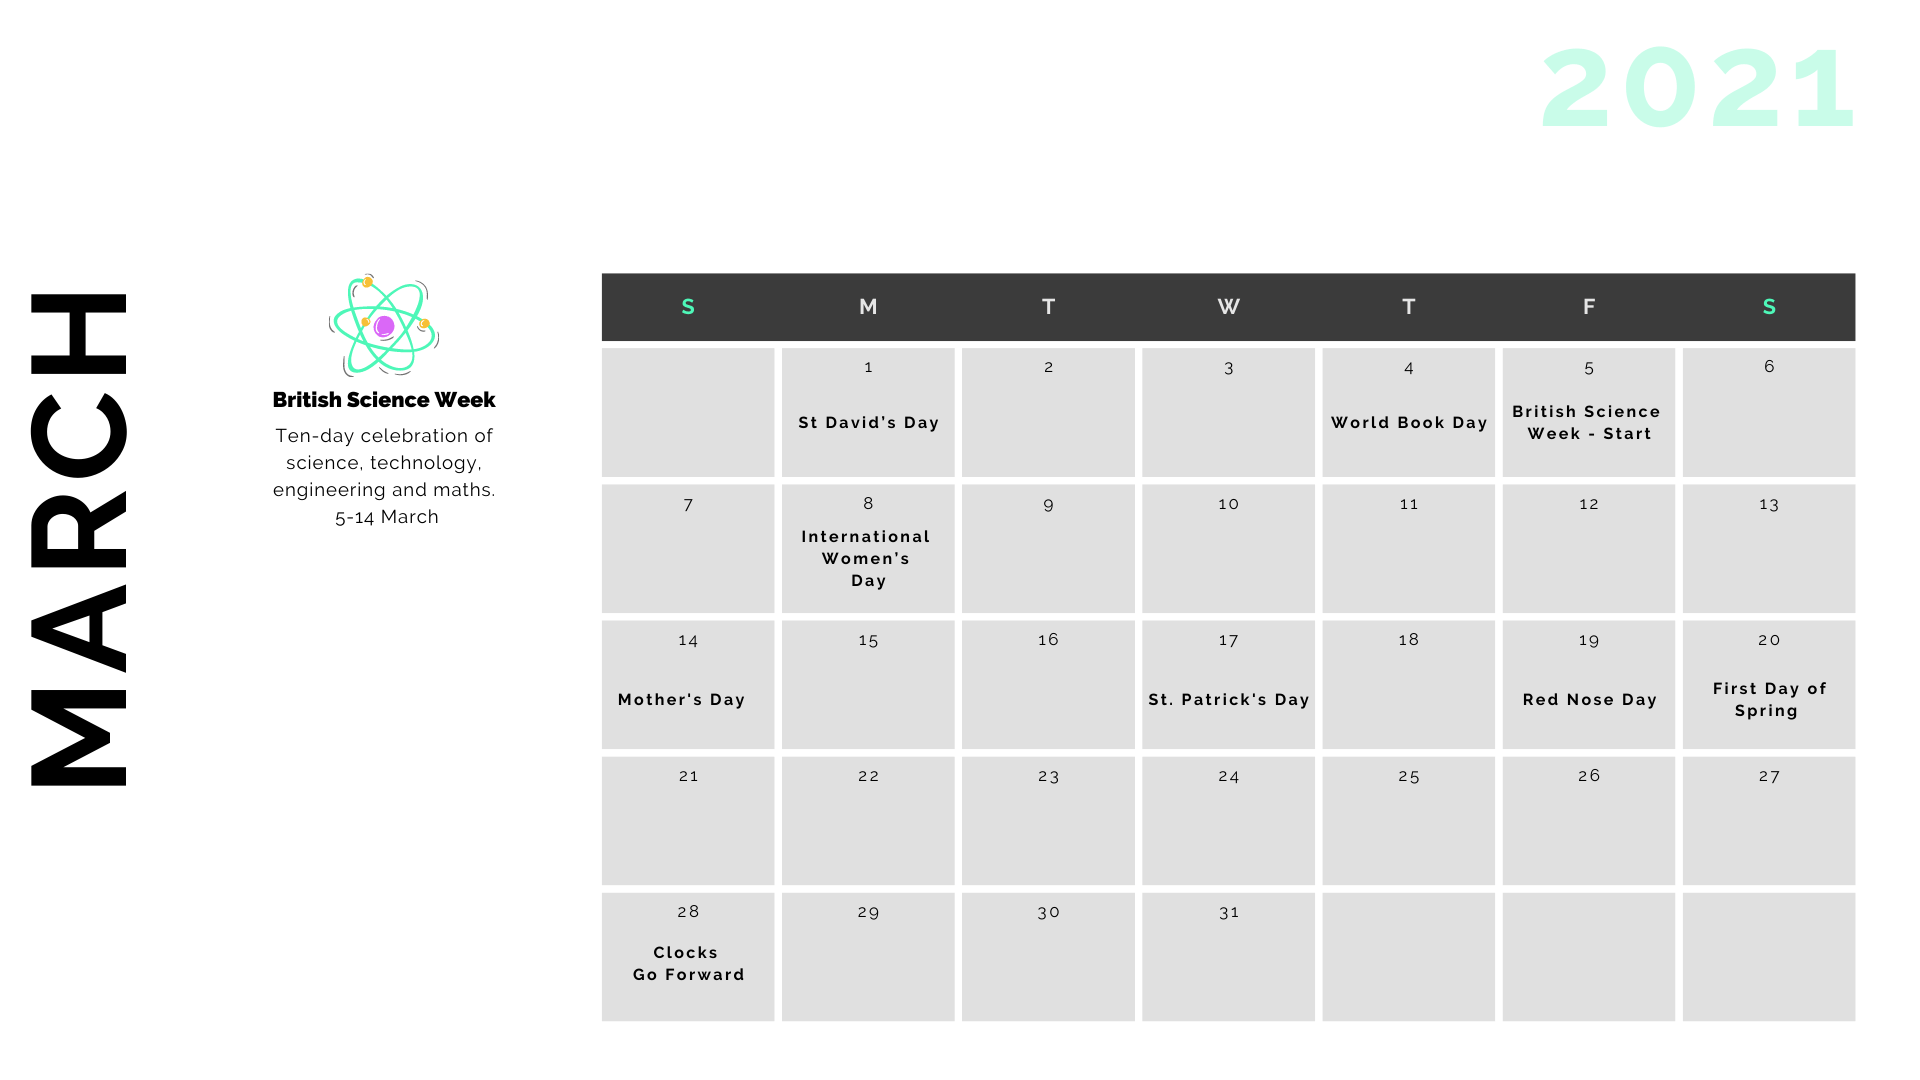 Retail Marketing Calendar 2021 - March